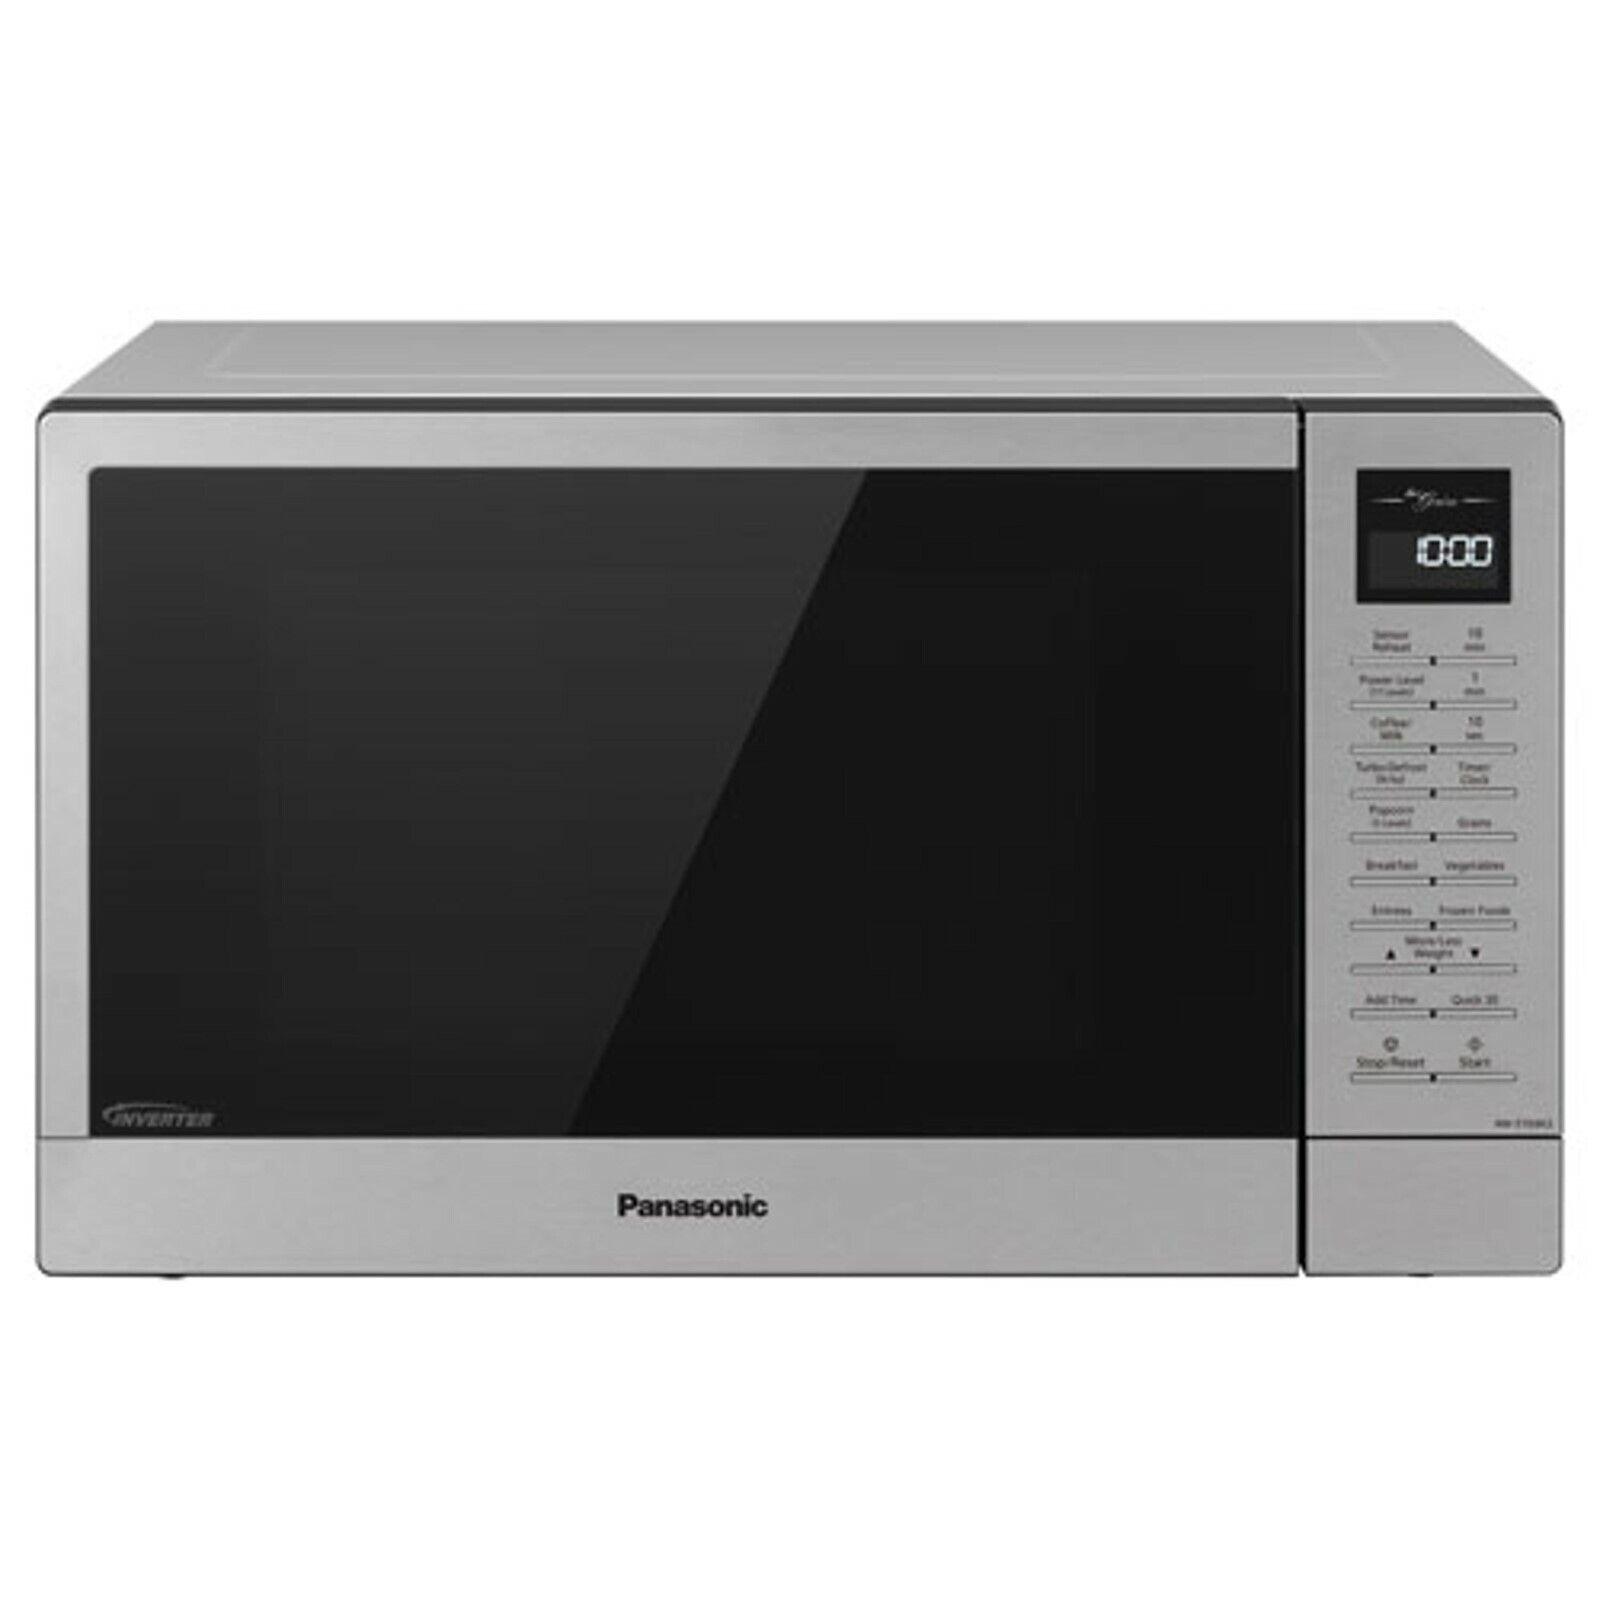 Panasonic Prestige Genius Microwavebestmicrowave